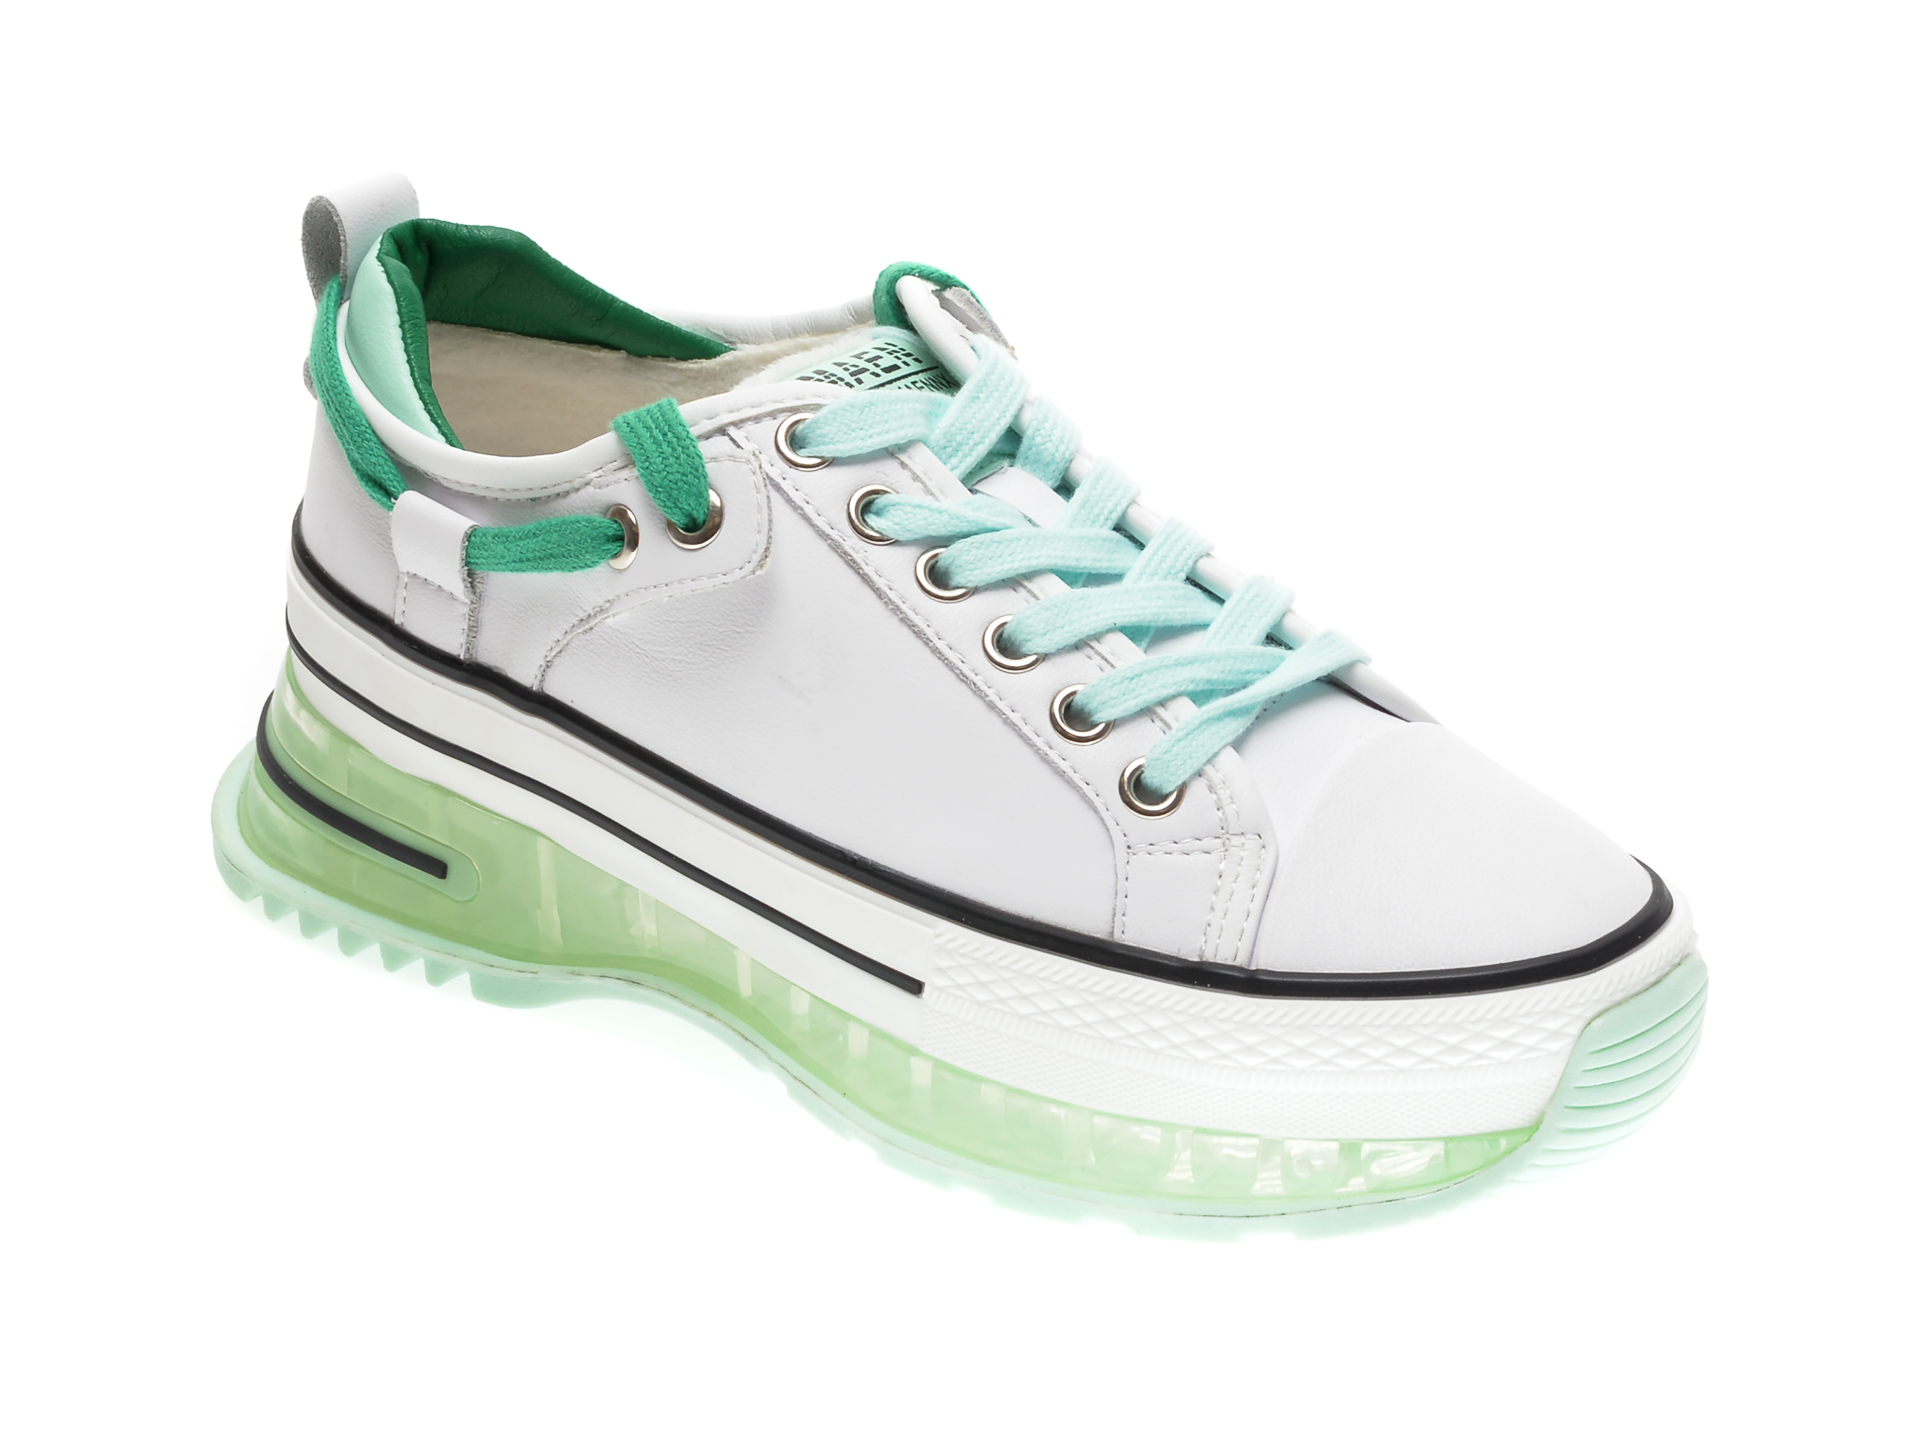 Pantofi sport GRYXX albi, 20208, din piele naturala imagine